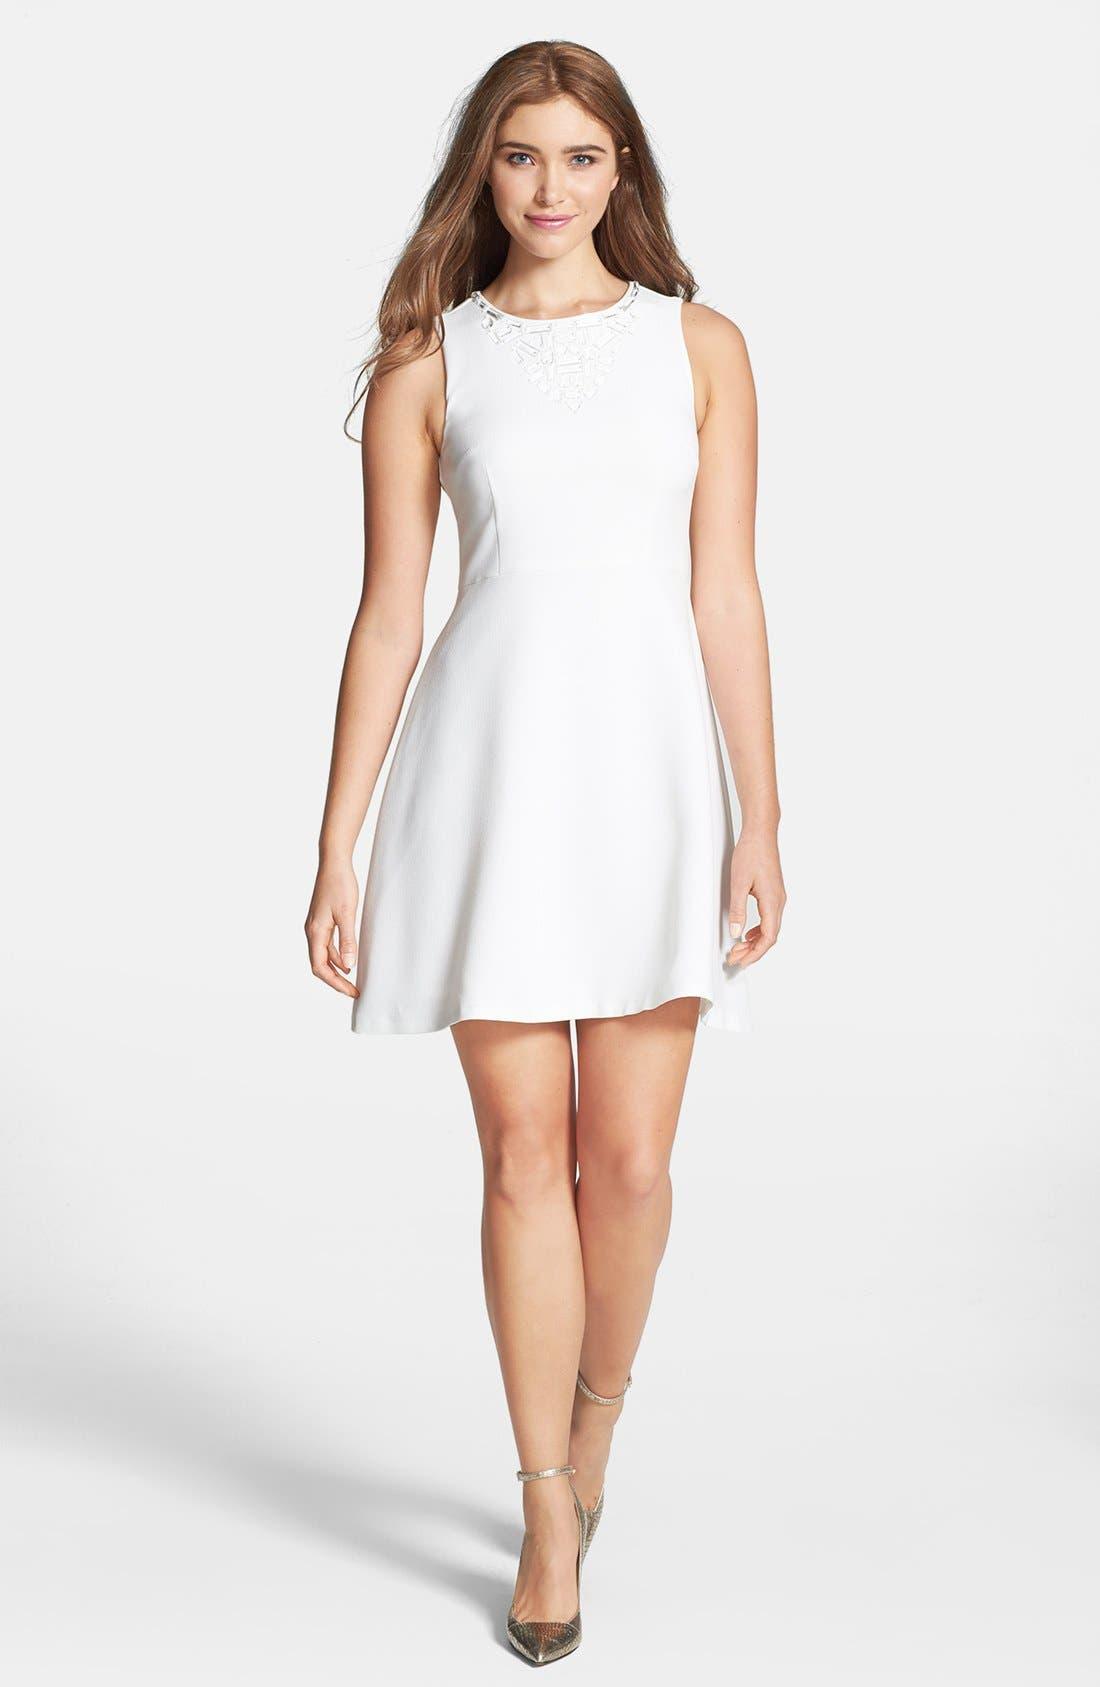 Alternate Image 1 Selected - Trina Turk 'Aldine' Crepe Fit & Flare Dress